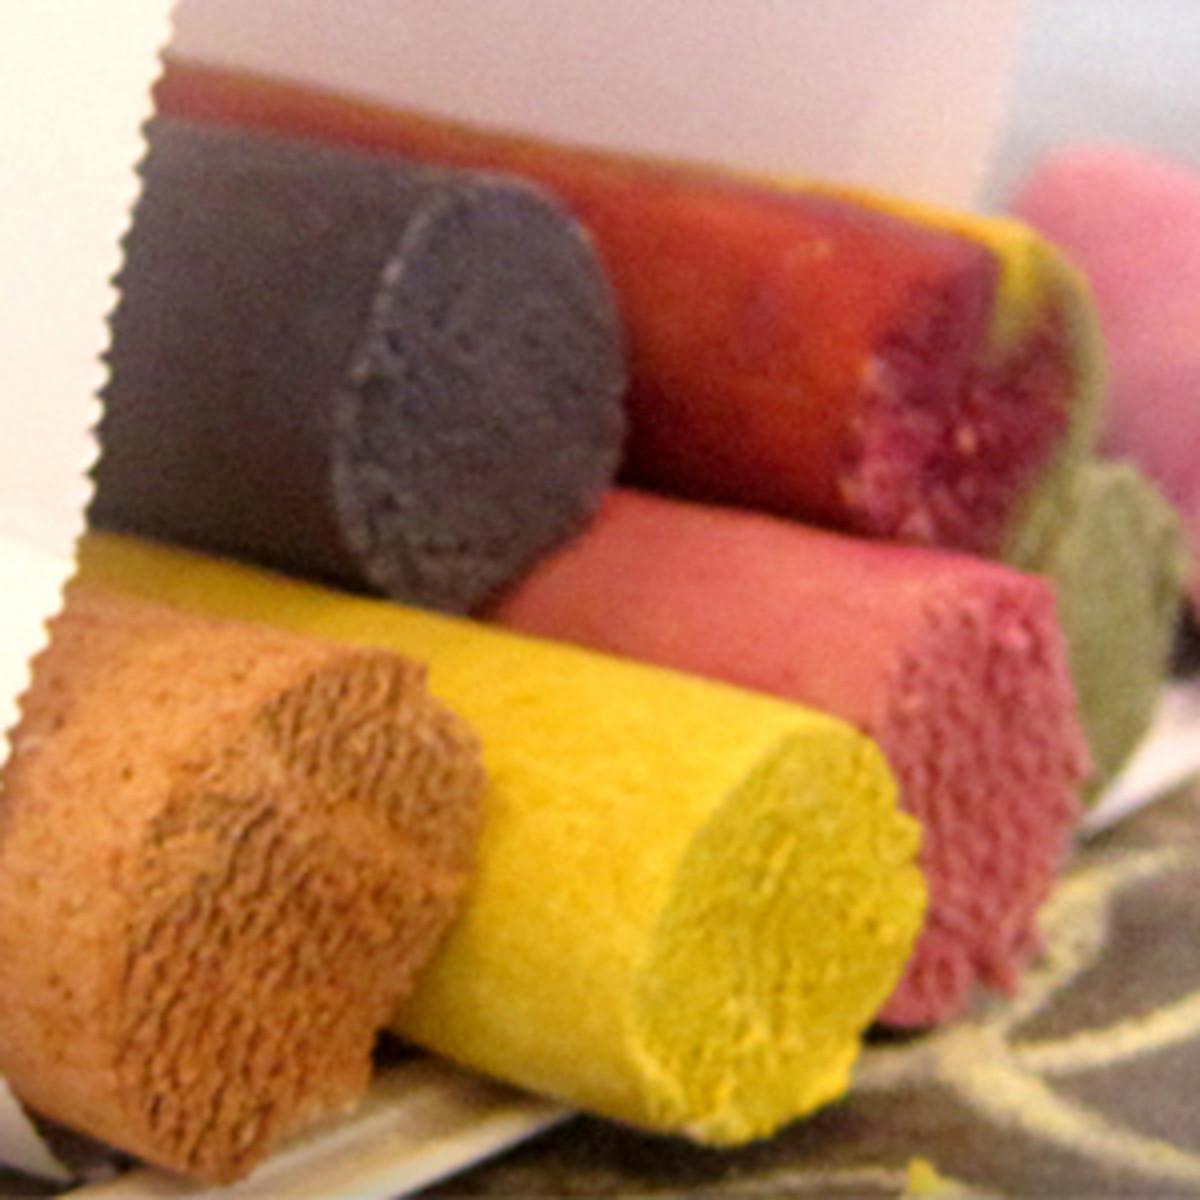 Organic, edible chalk